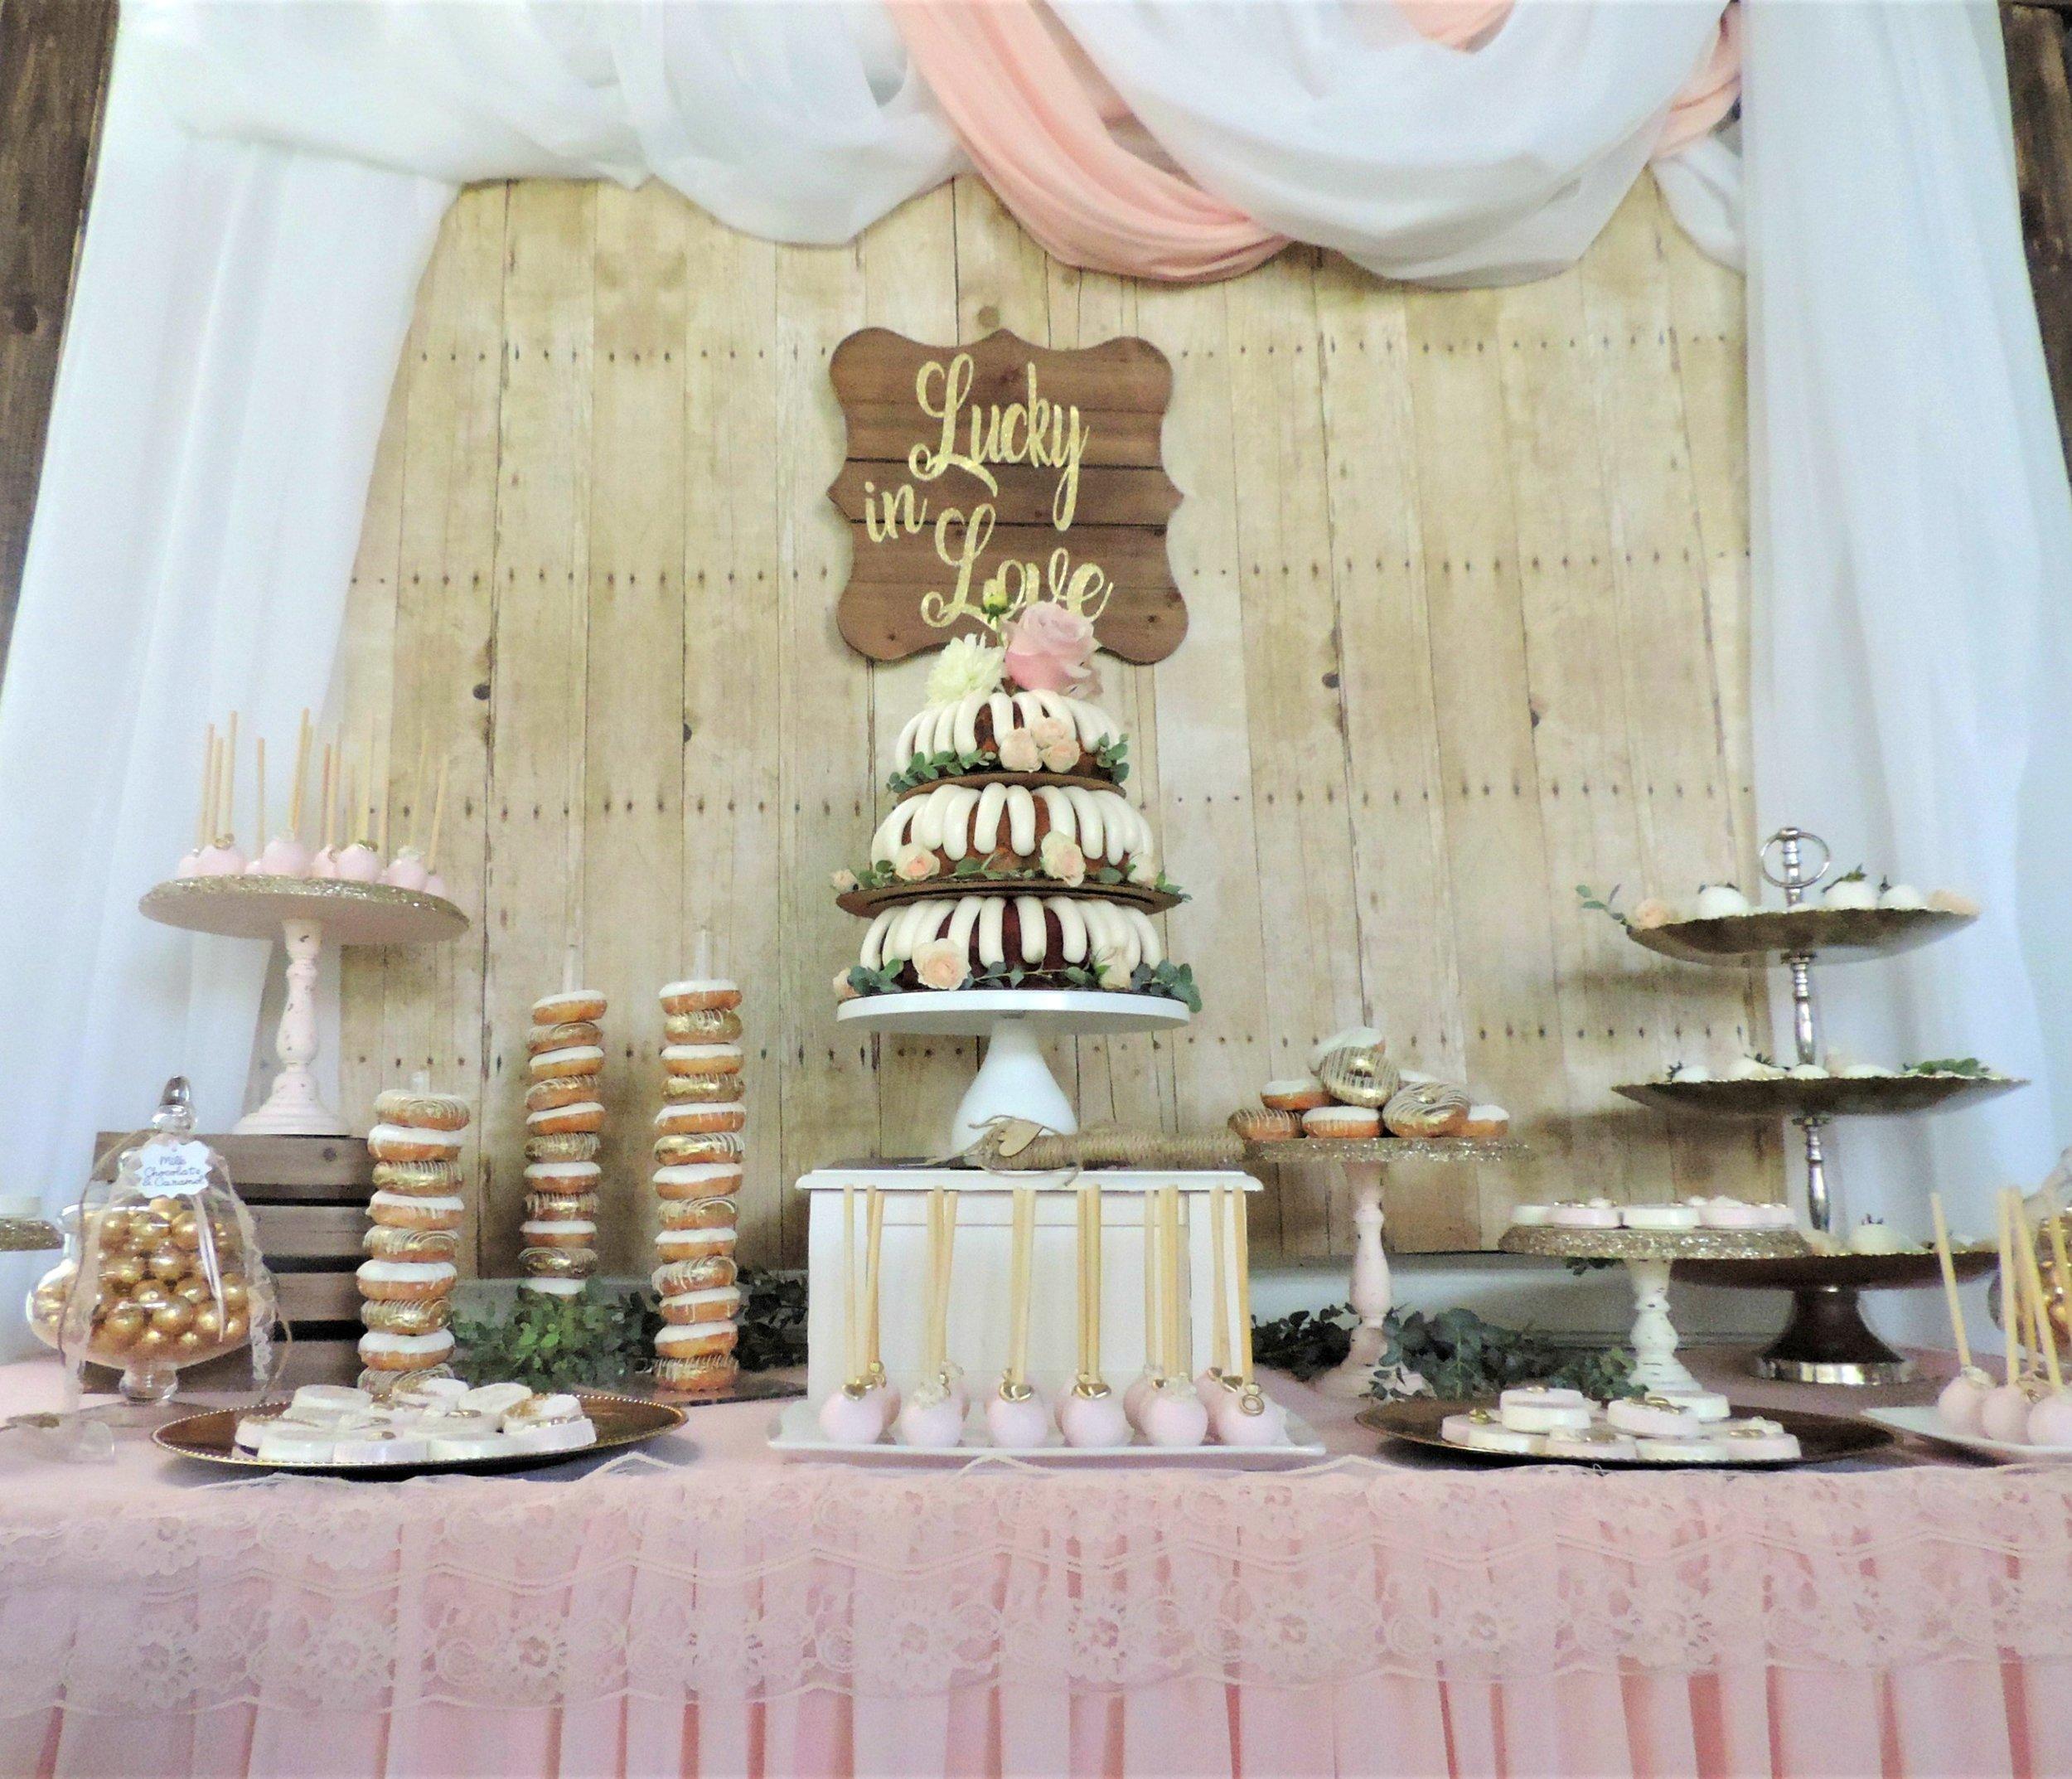 Rustic Wedding-Blush Pink and Gold Wedding-Wedding Dessert Table-Wedding Ideas-Lucky In Love-www.SugarPartiesLA.com.jpg